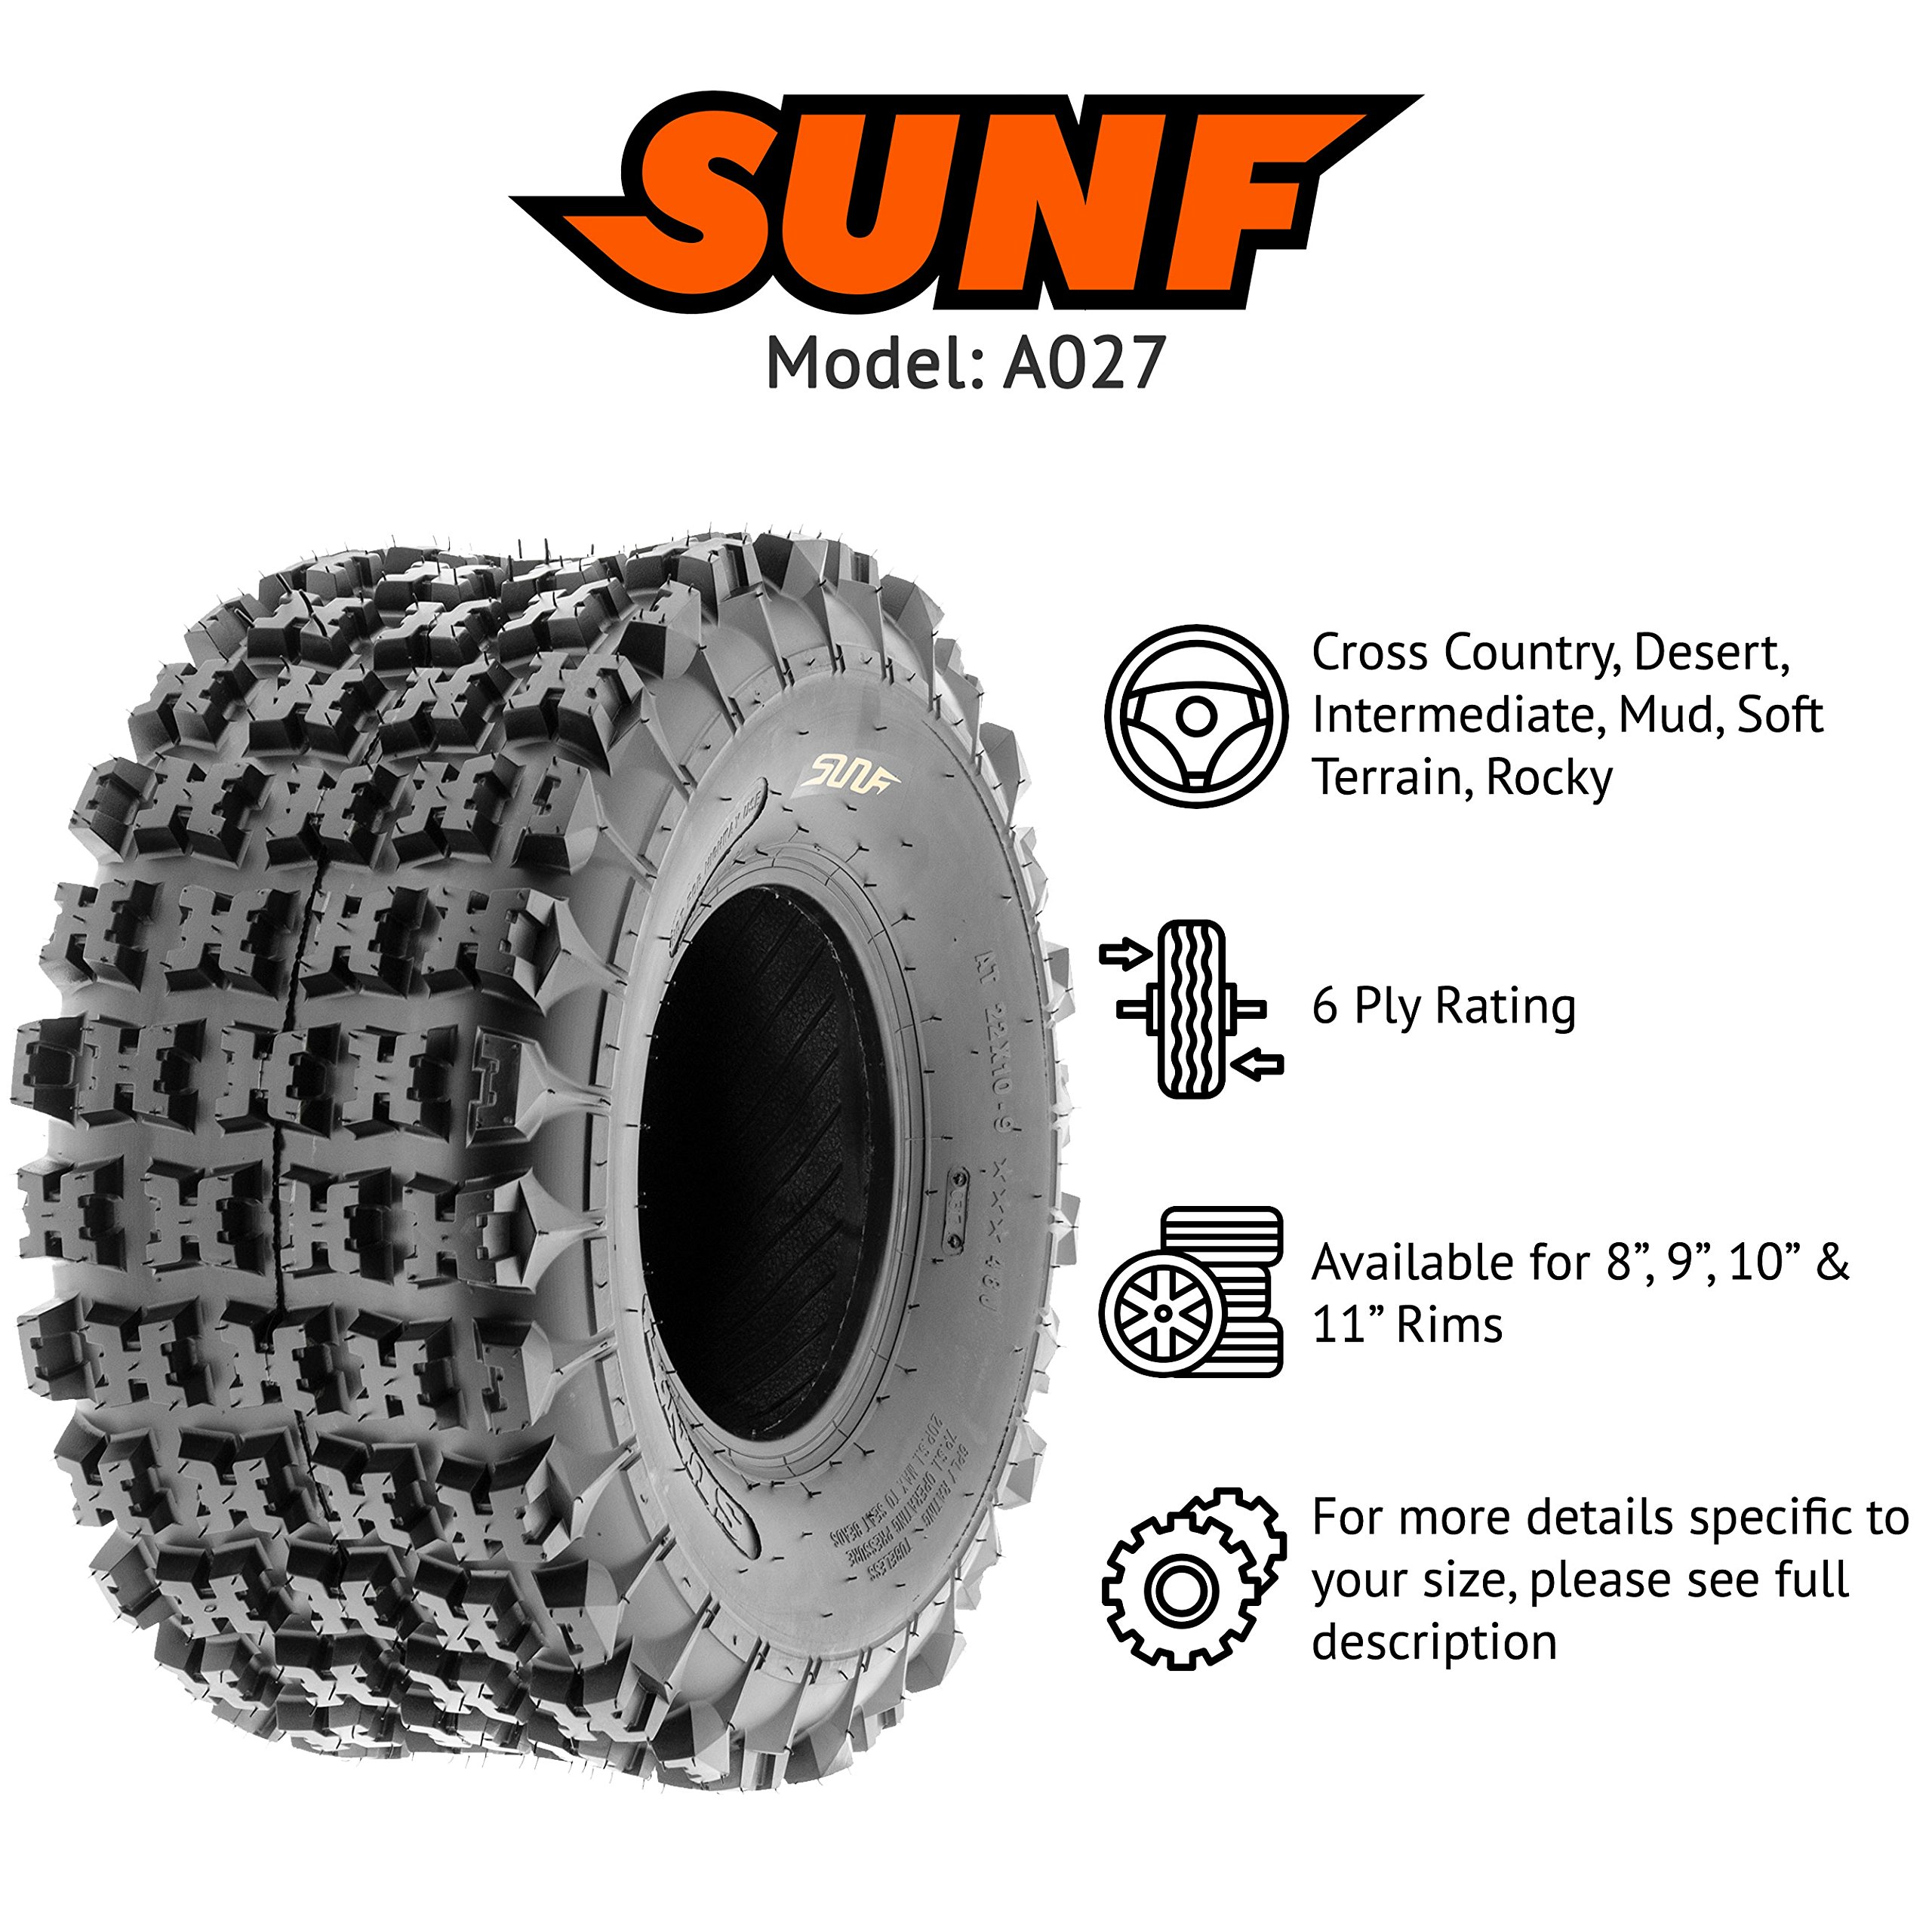 SunF 18x10.5-8 18x10.5x8 ATV UTV All Terrain Race Replacement 6 PR Tubeless Tires A027, [Set of 2] by SunF (Image #2)